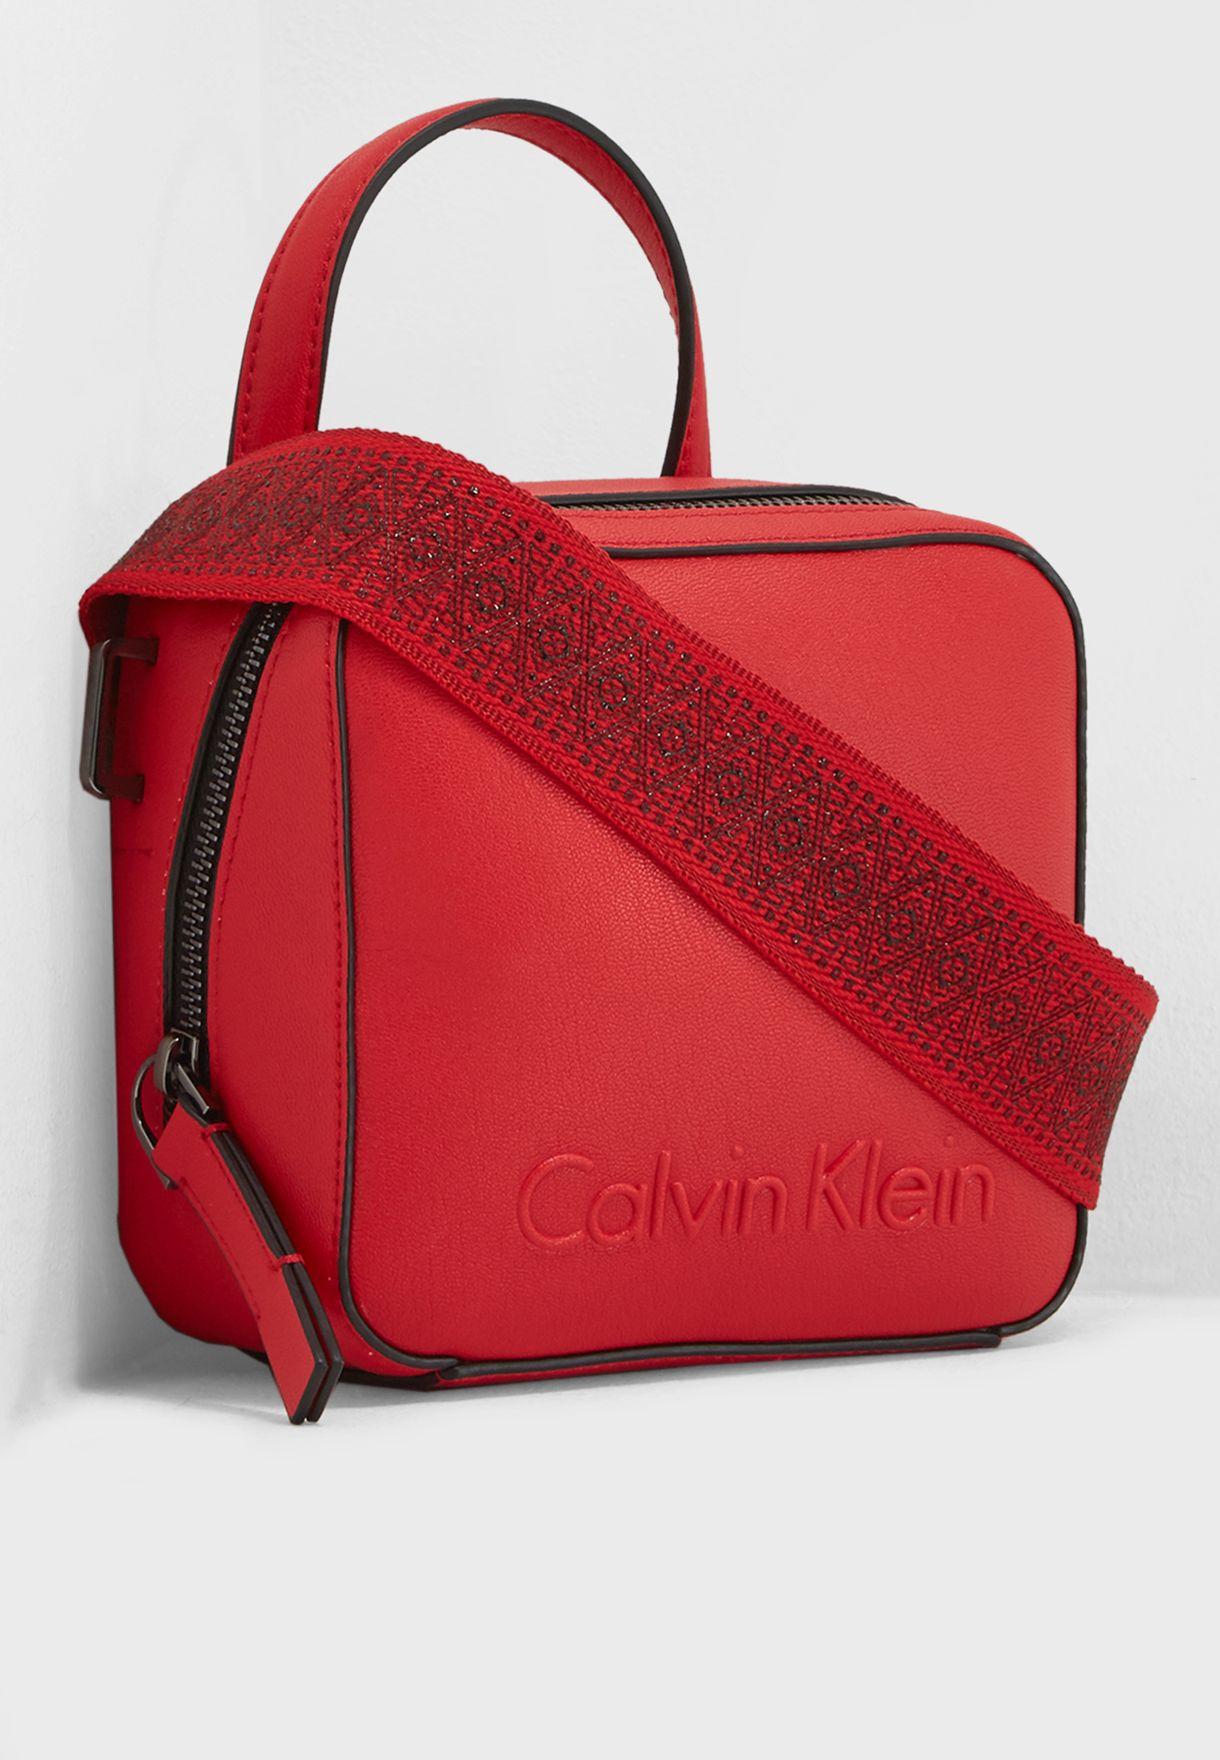 9faddaac24a7 Shop Calvin Klein red Small Edge Seasonal Crossbody K60K604002 for ...